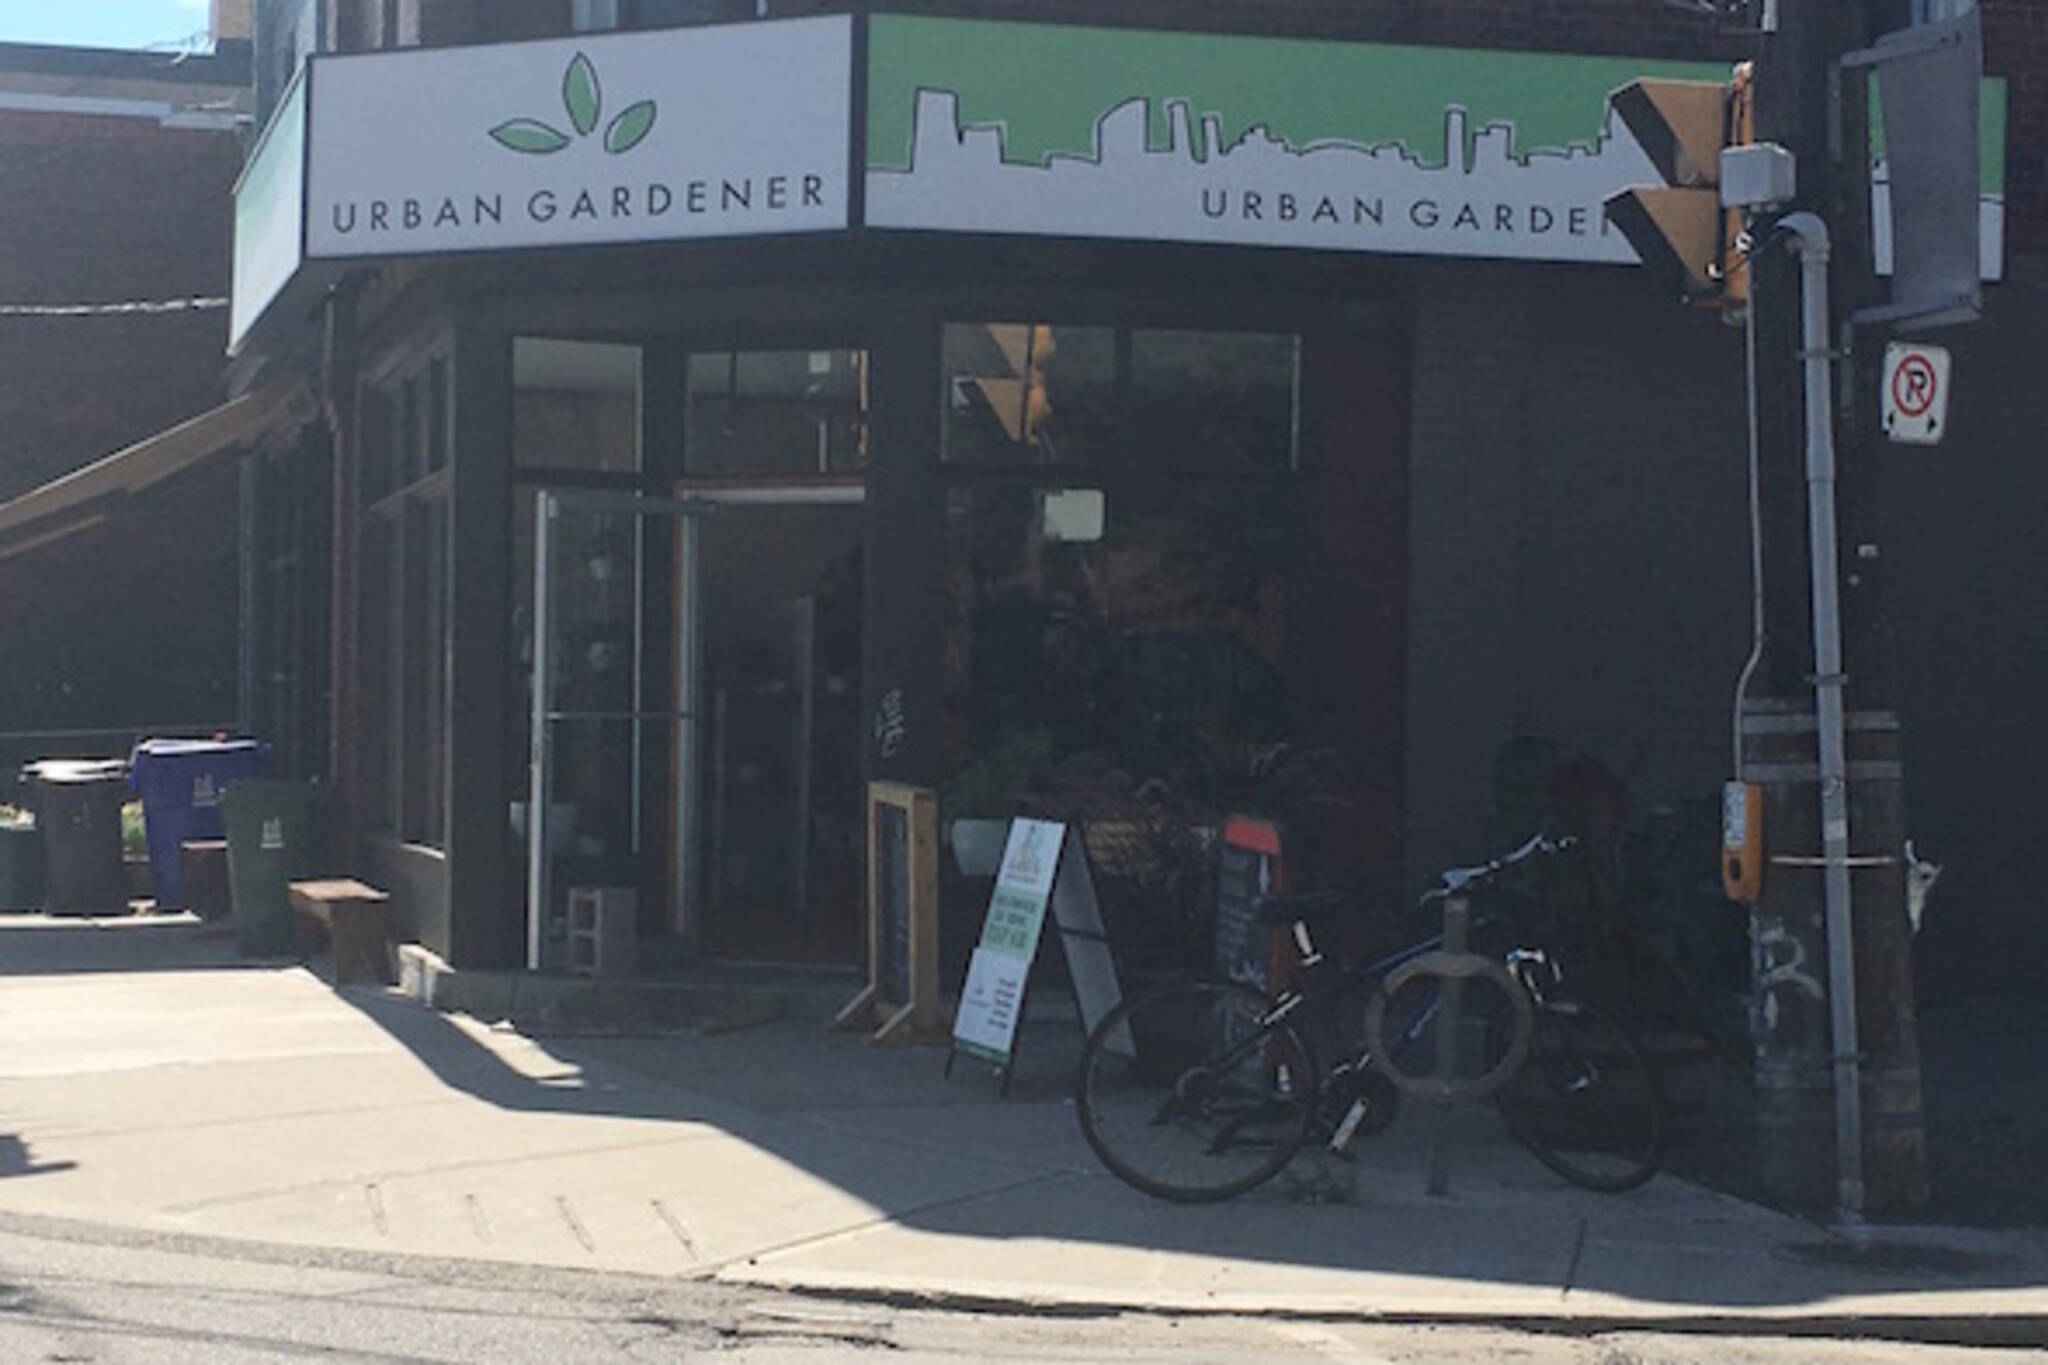 Urban Gardener Toronto